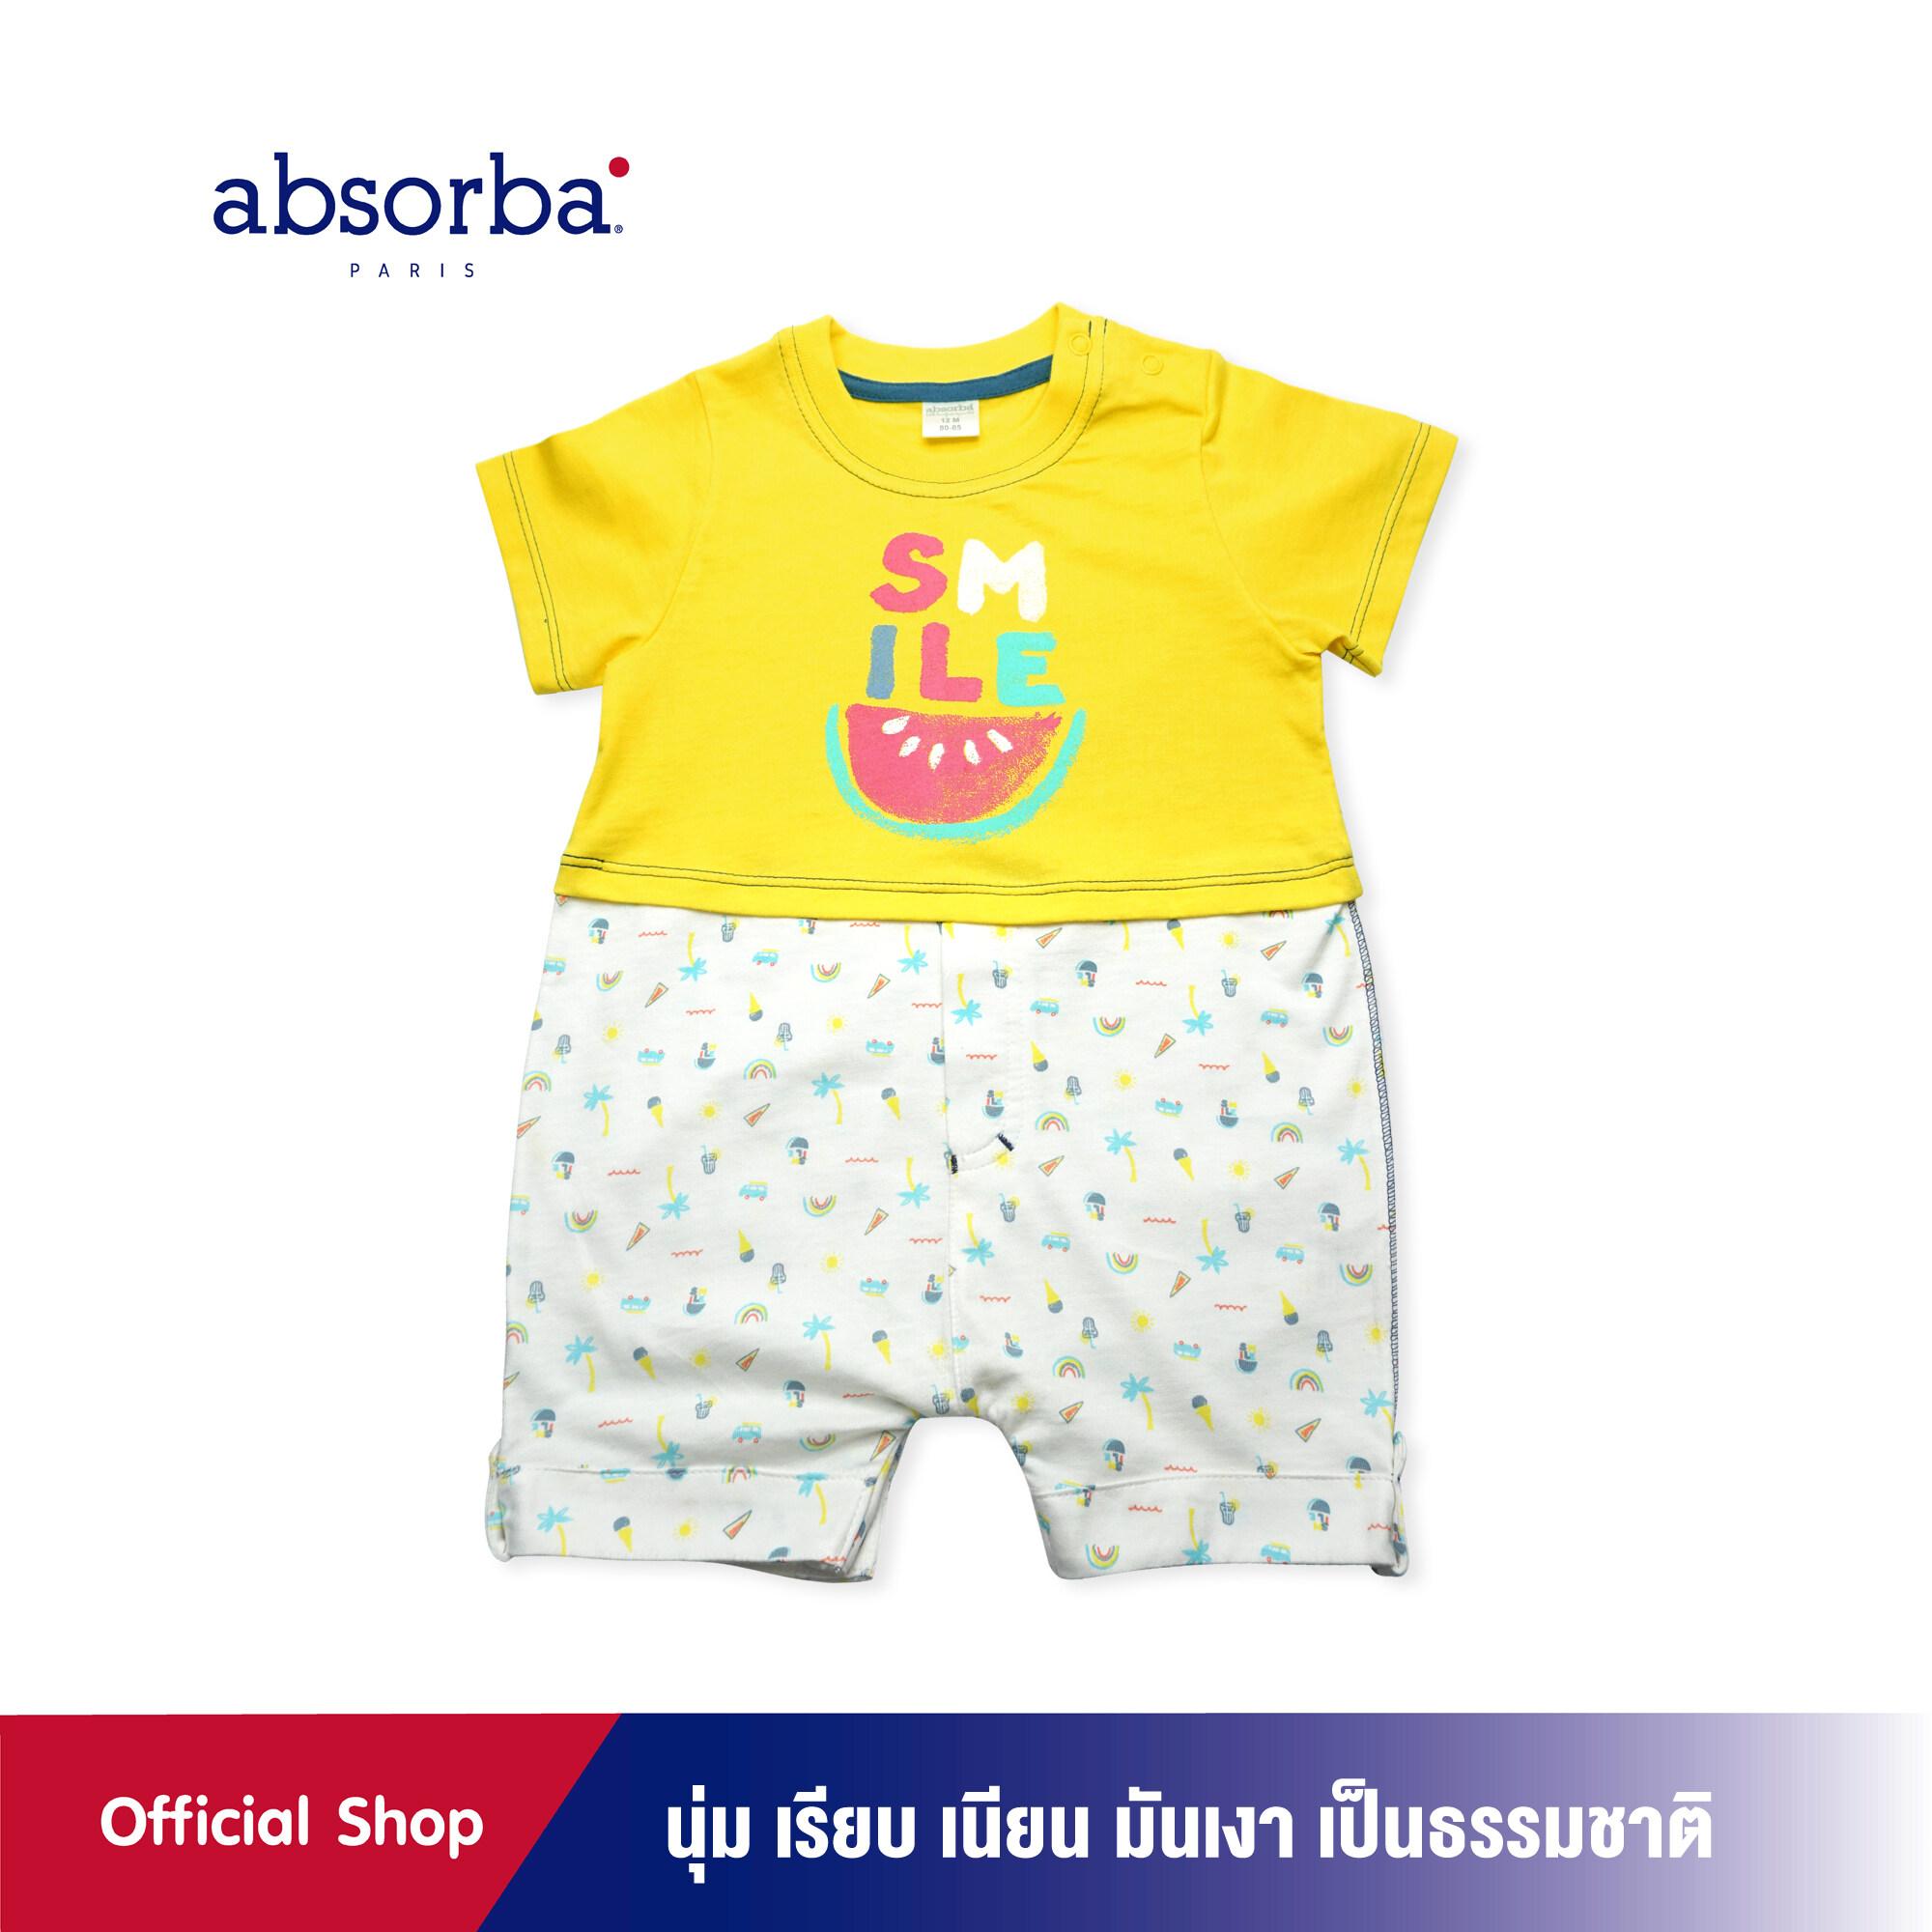 absorba (แอ๊บซอร์บา) ชุดหมีขาสั้นเด็กอ่อน คอลเลคชั่น Ice Cream สำหรับเด็กอายุ 3 เดือน ถึง 2 ปี - R1H9003YE ชุดเด็กผู้ชาย